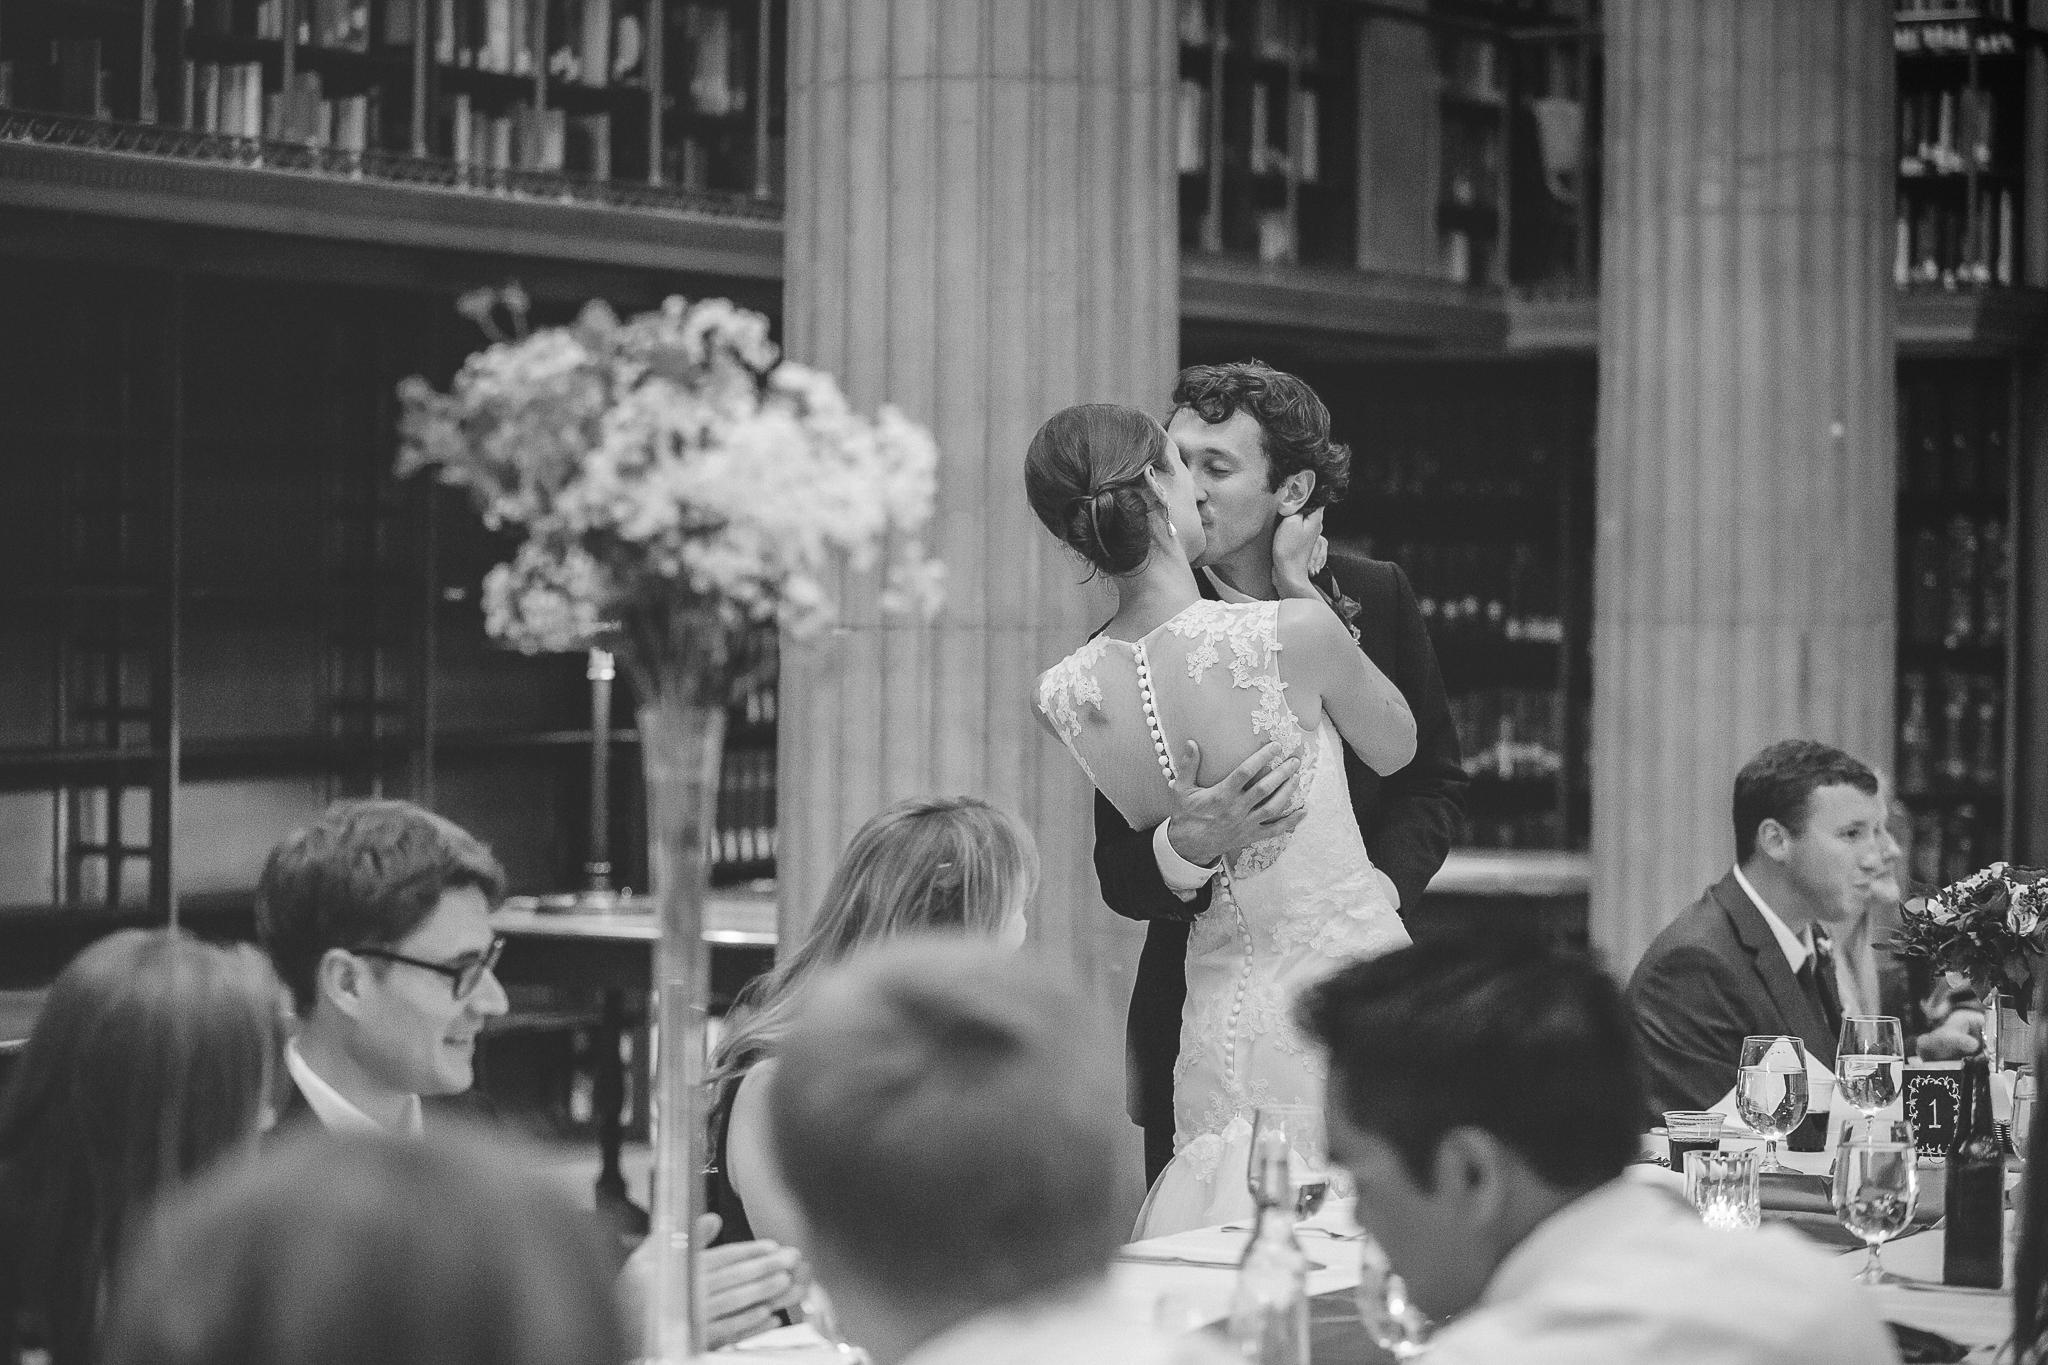 james j hill library wedding photography-26.jpg